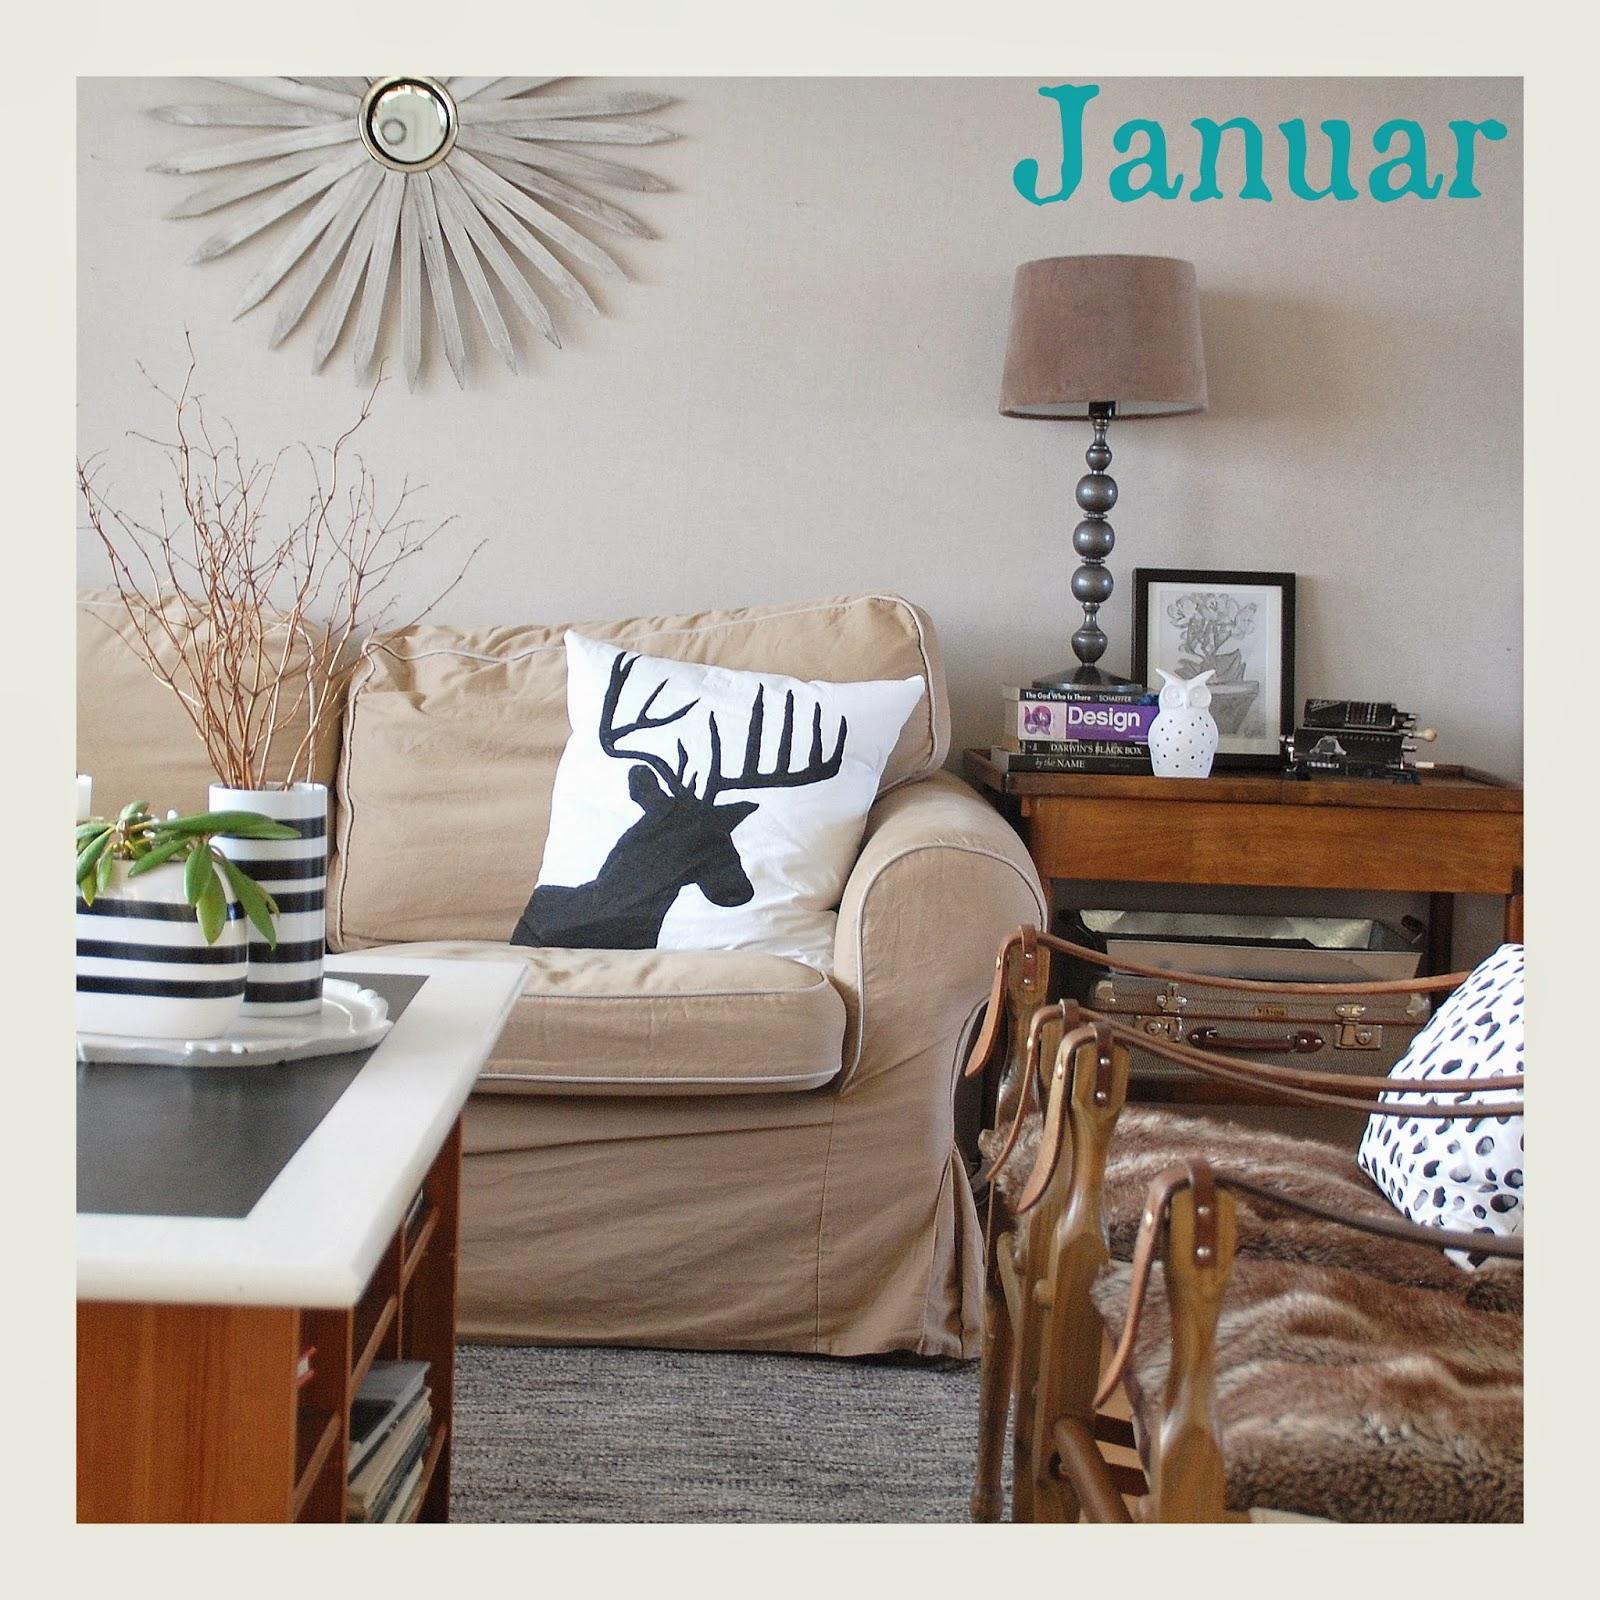 White as linen: january 2014